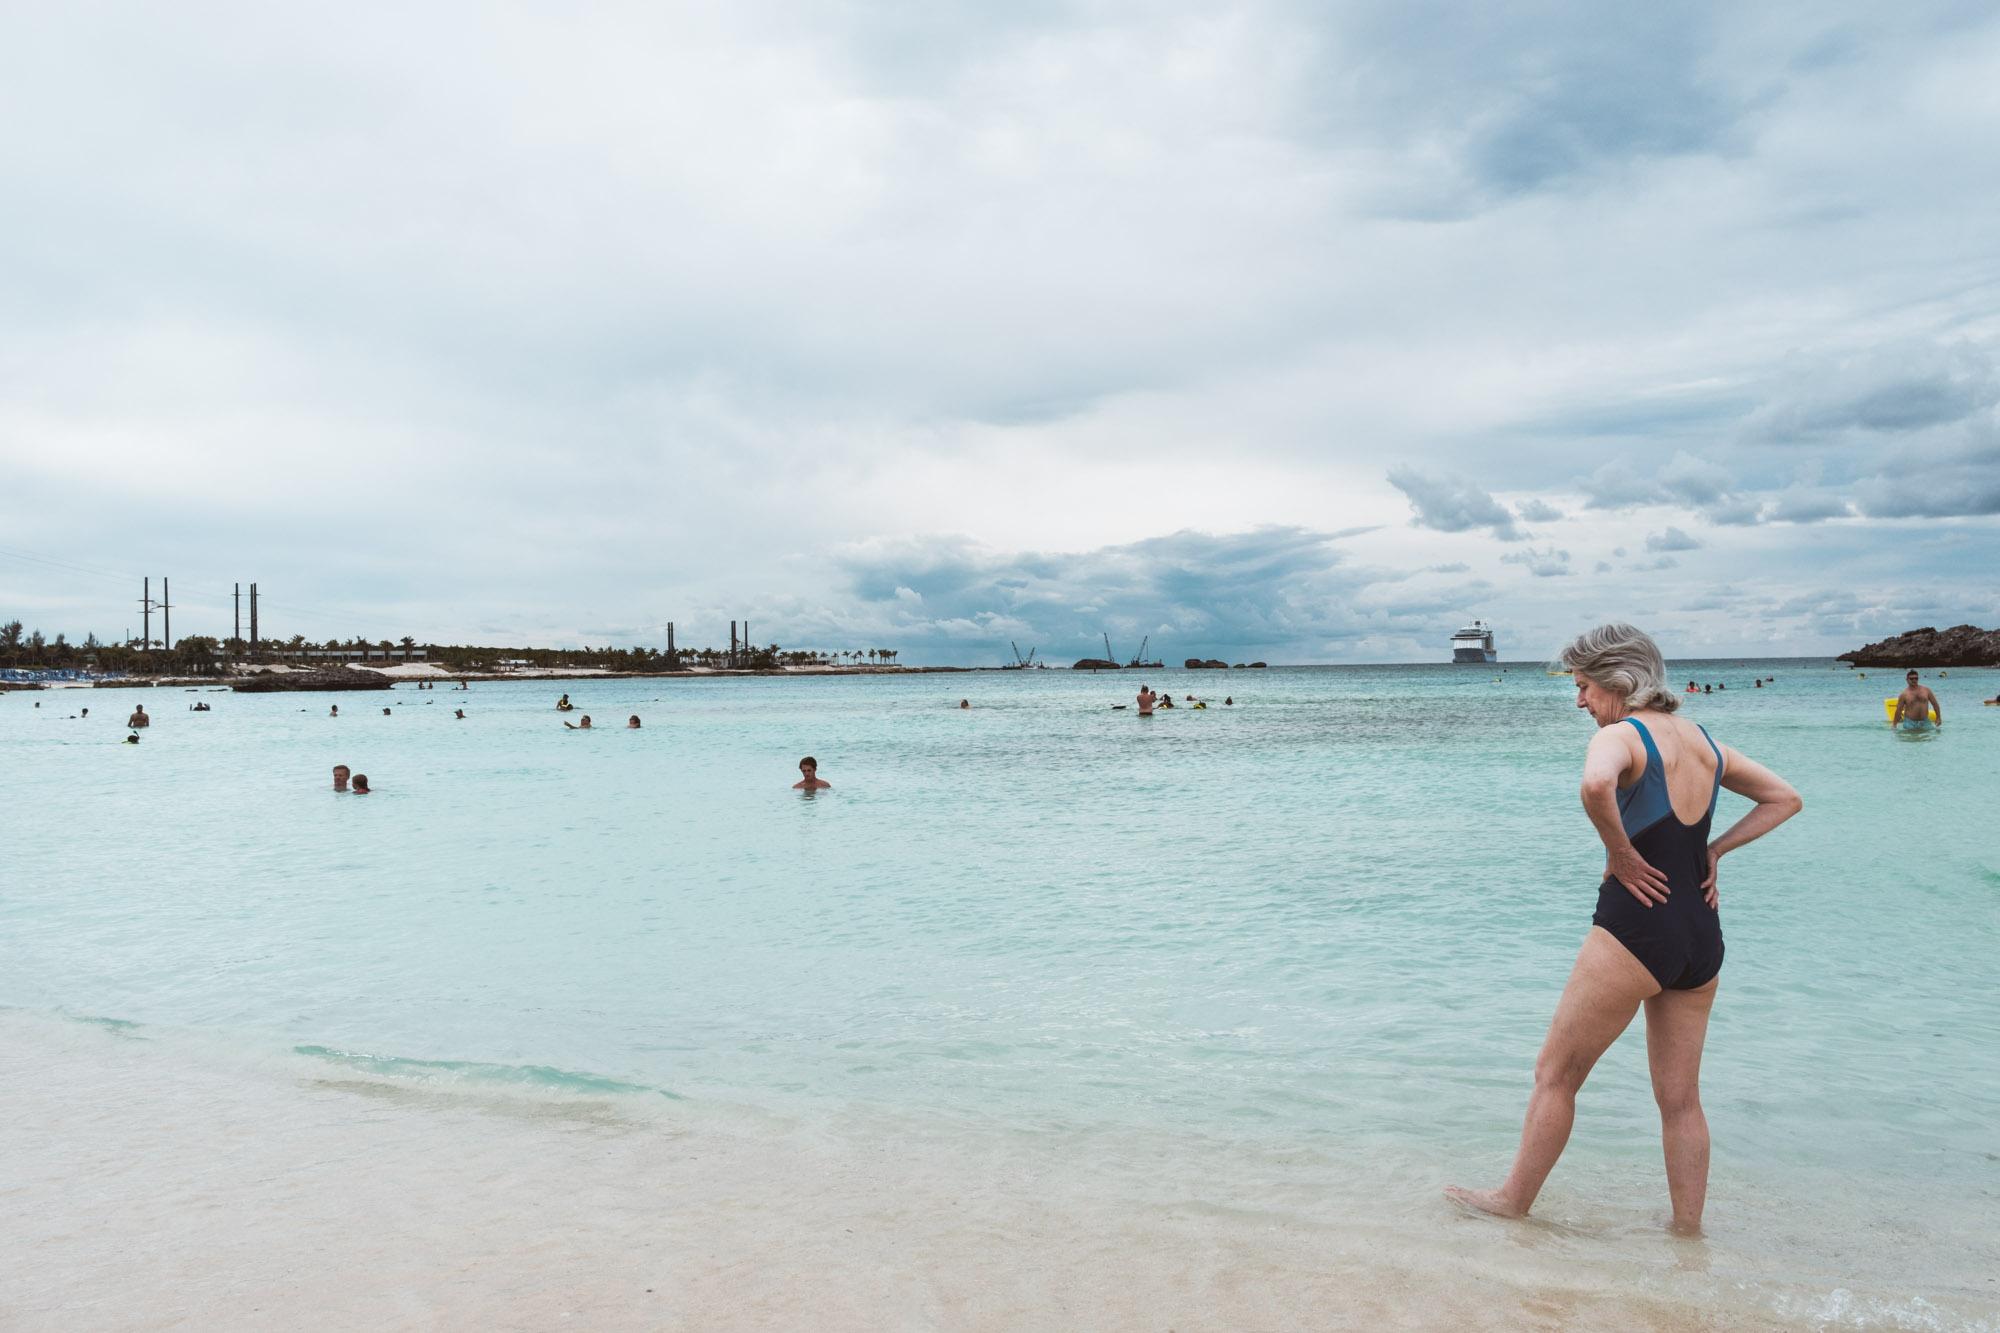 woman-beach-great-stirrup-cay-norweigan-sky-bahamas